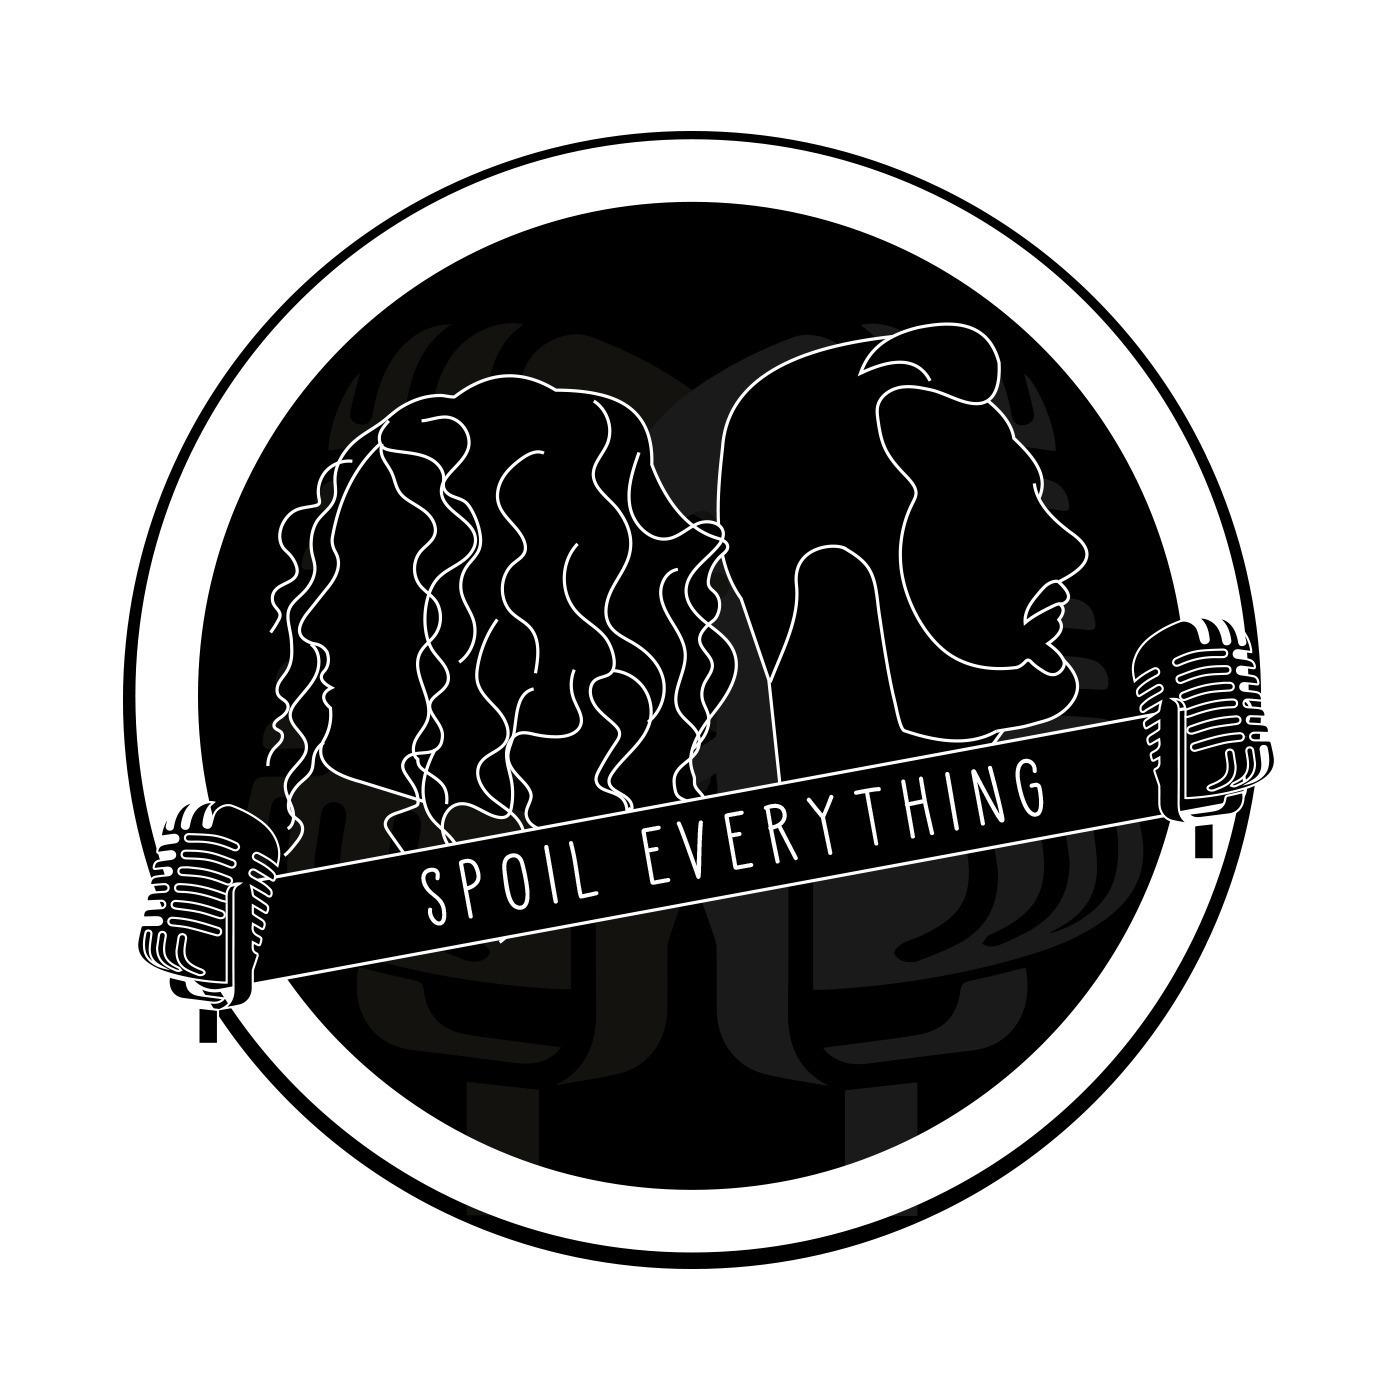 Courtney & Joe Spoil Everything